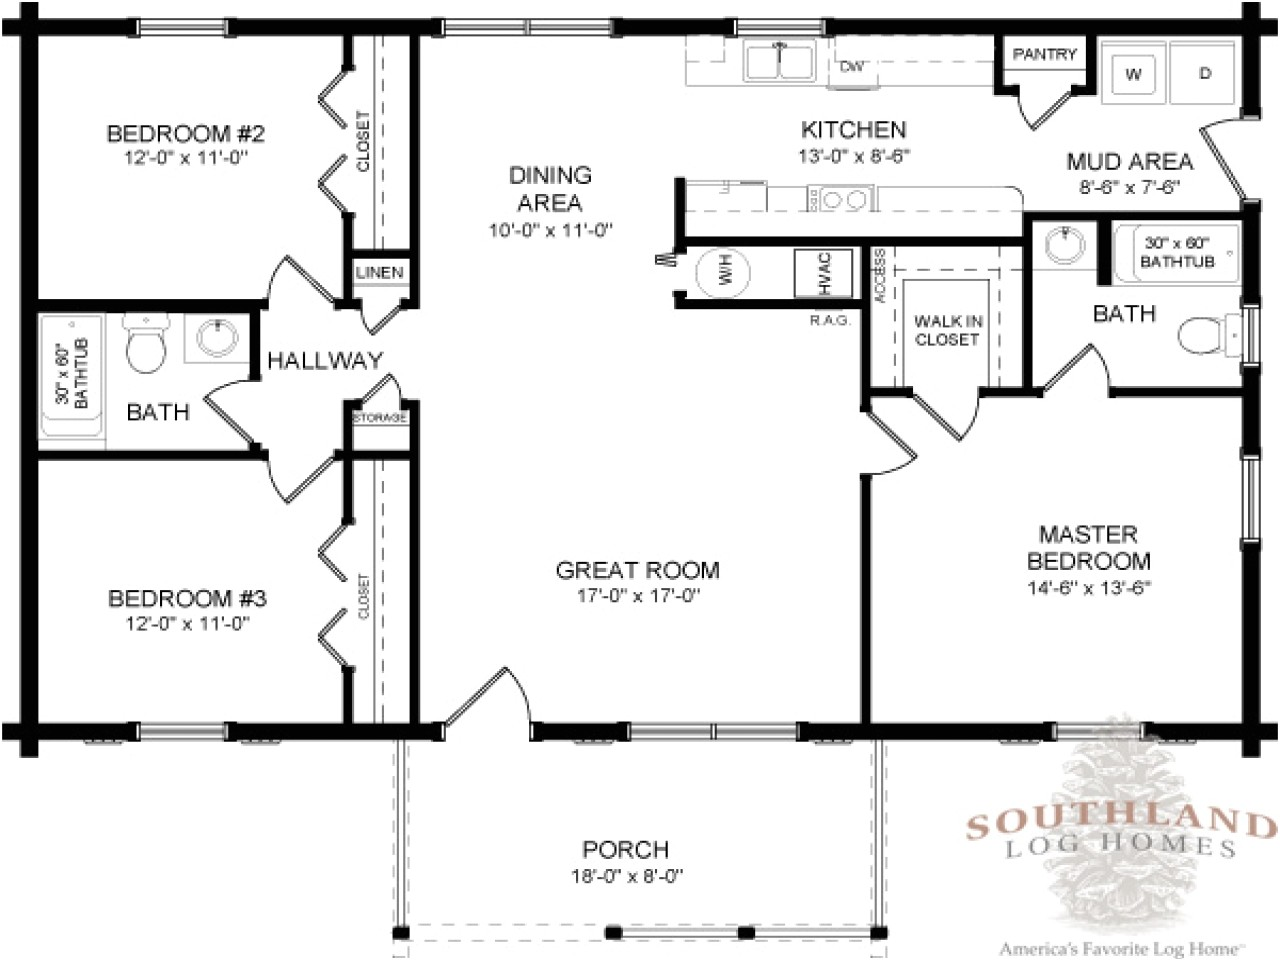 1c9d9d0a42dd66f9 single story log home floor plans large single story log homes